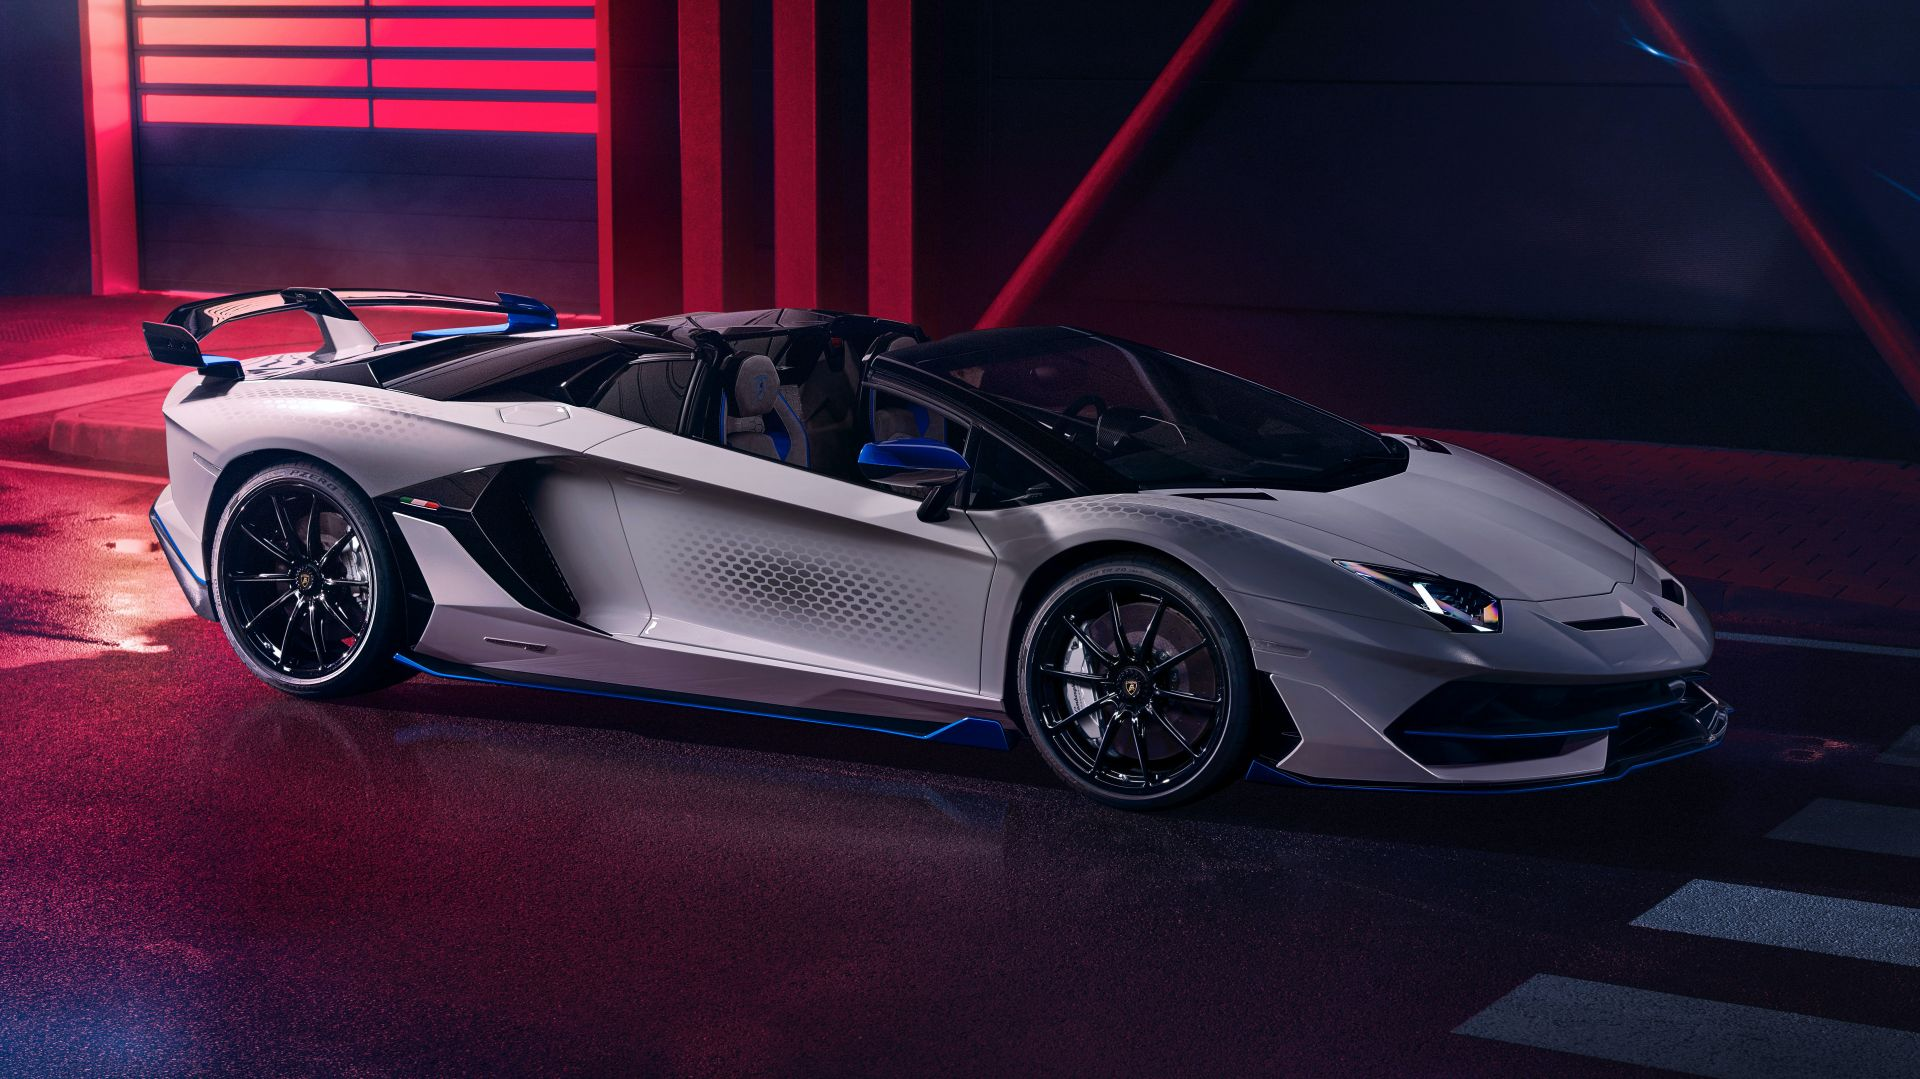 Lamborghini-Aventador-SVJ-Xago-Edition-7